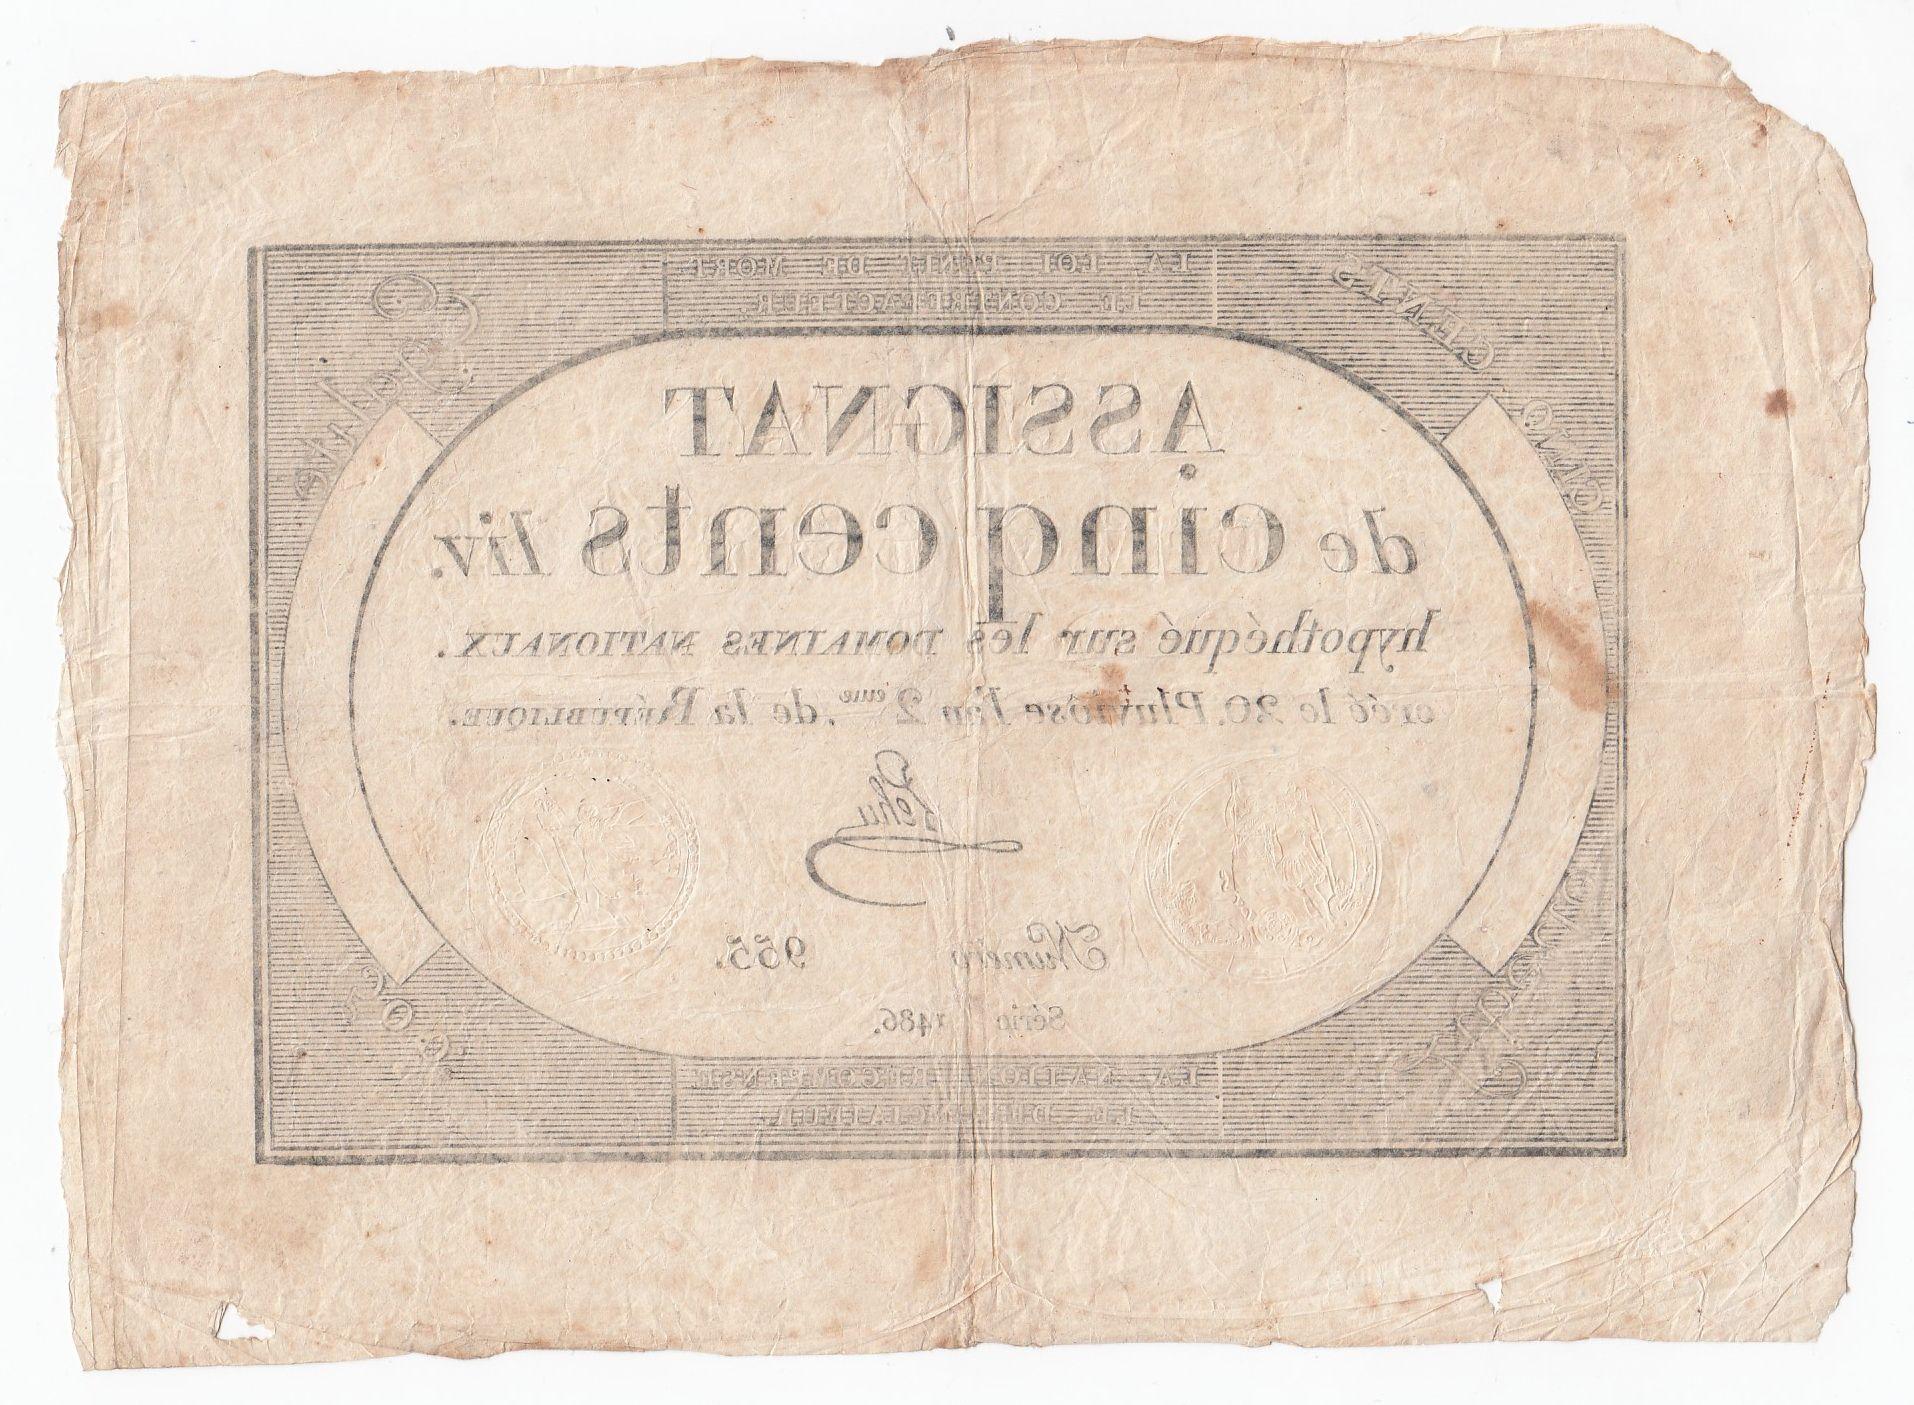 France 500 Livres 20 Pluviose An II (8.2.1794) - Sign. Lehu